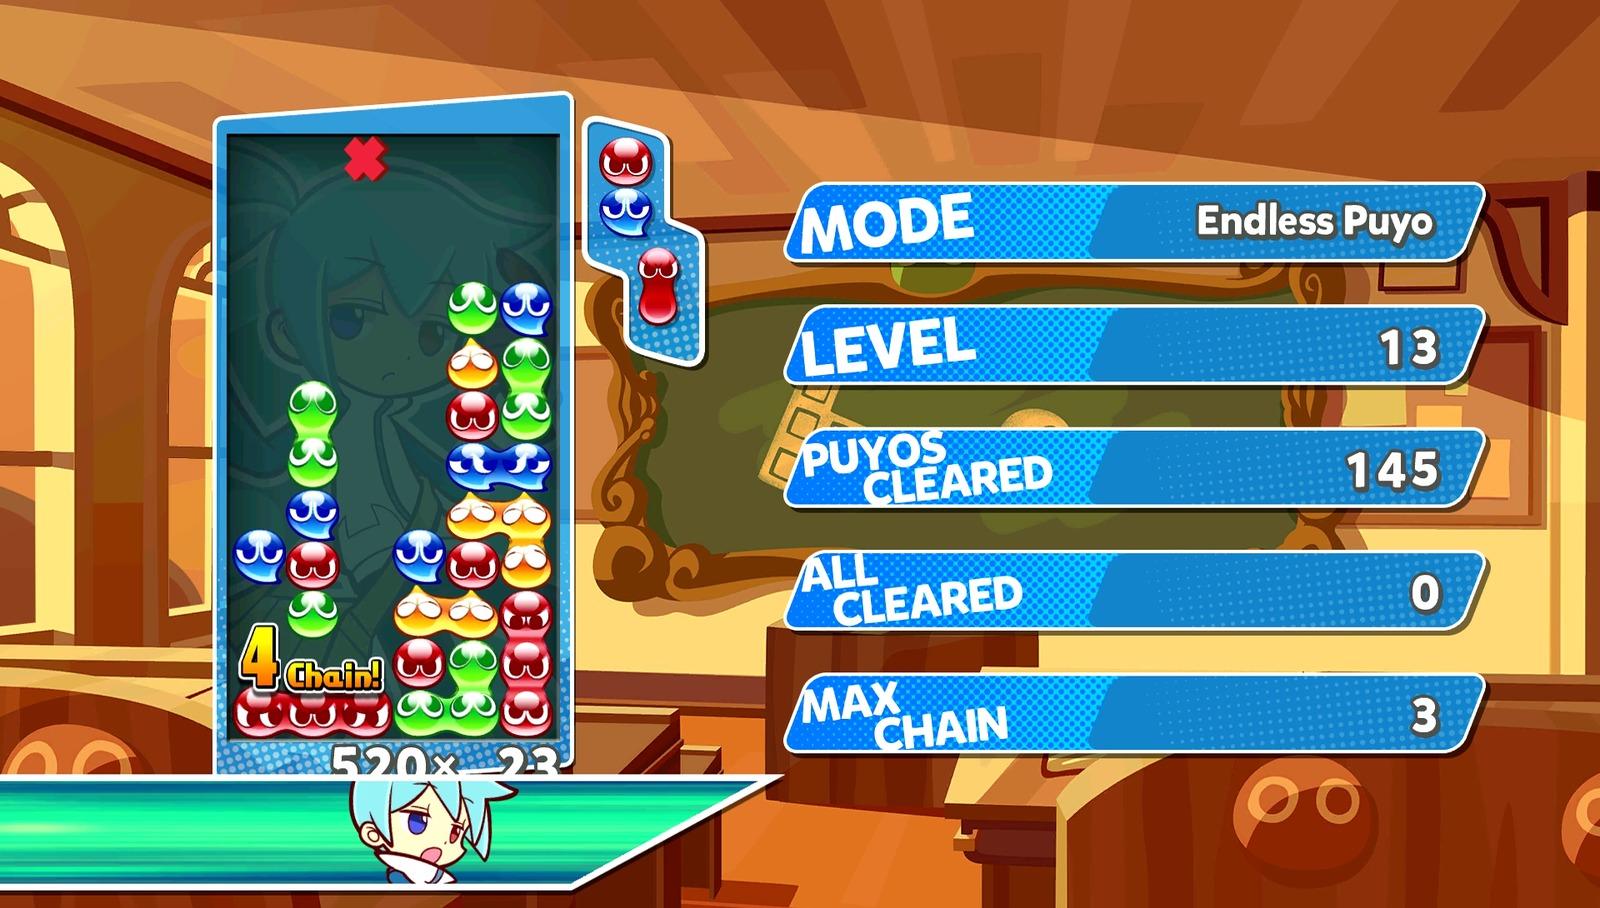 Puyo Puyo Tetris for PS4 image